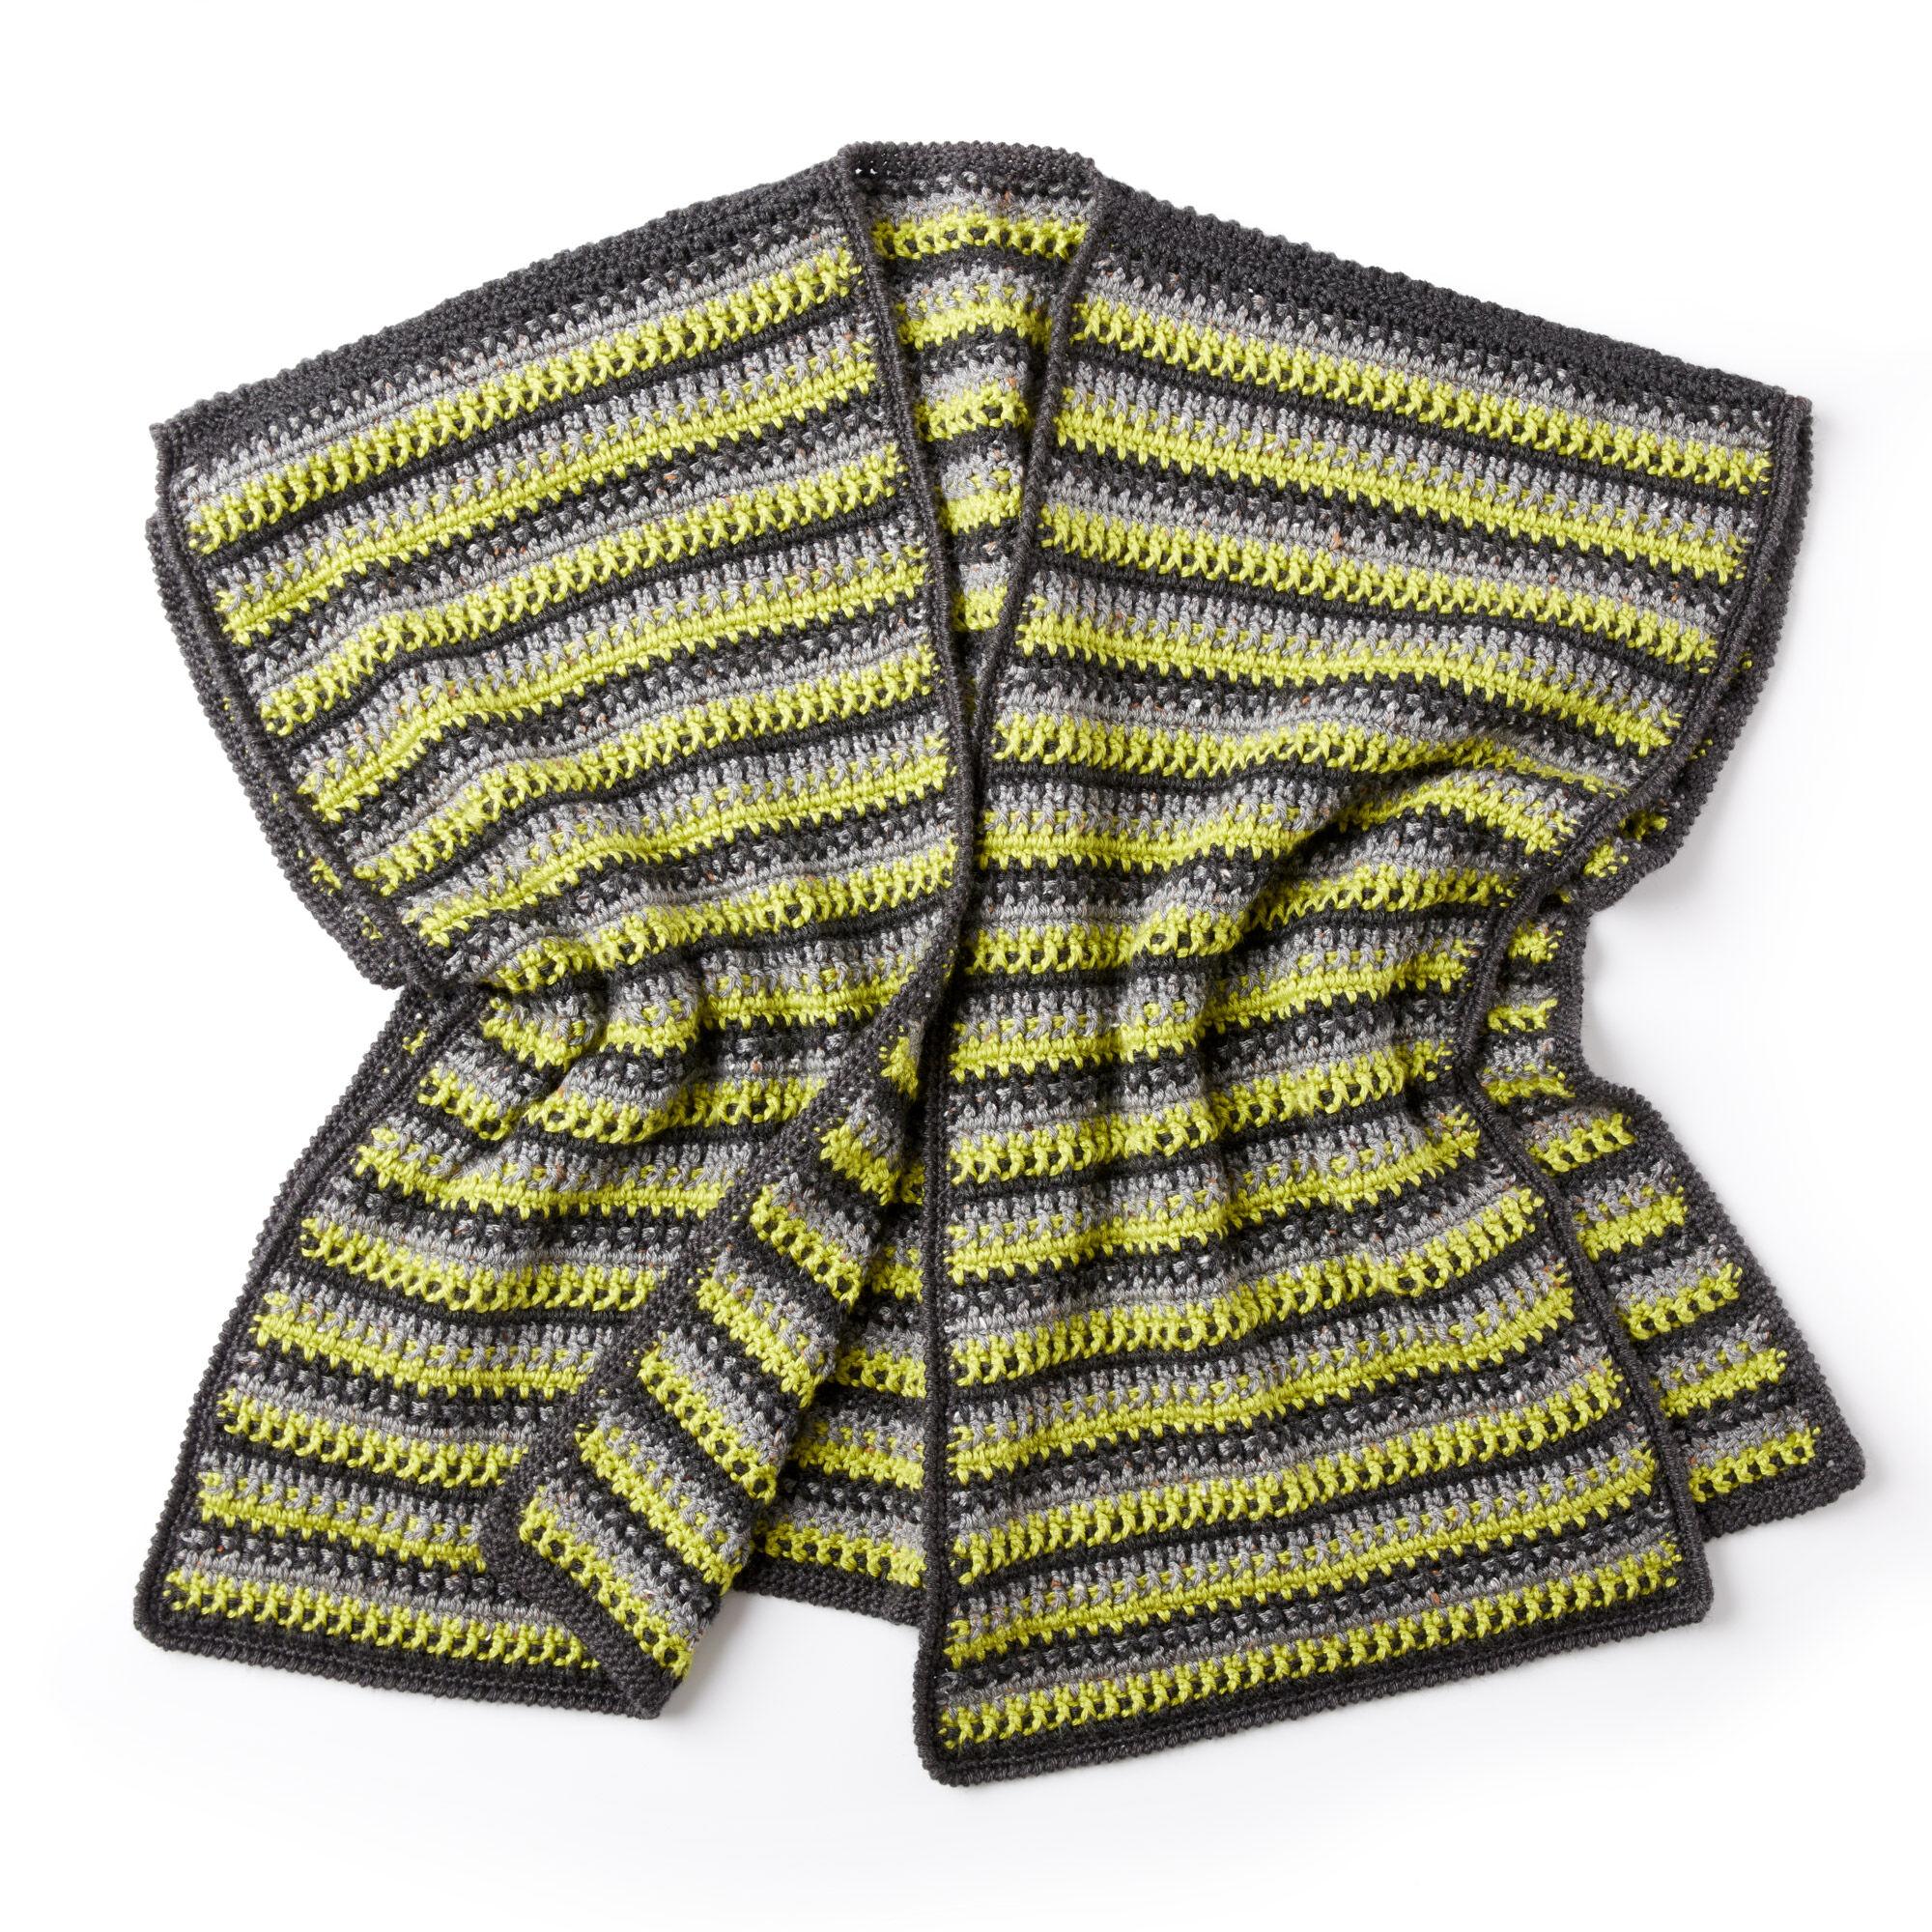 Caron Textured Stripes Crochet Ruana Pattern   Yarnspirations